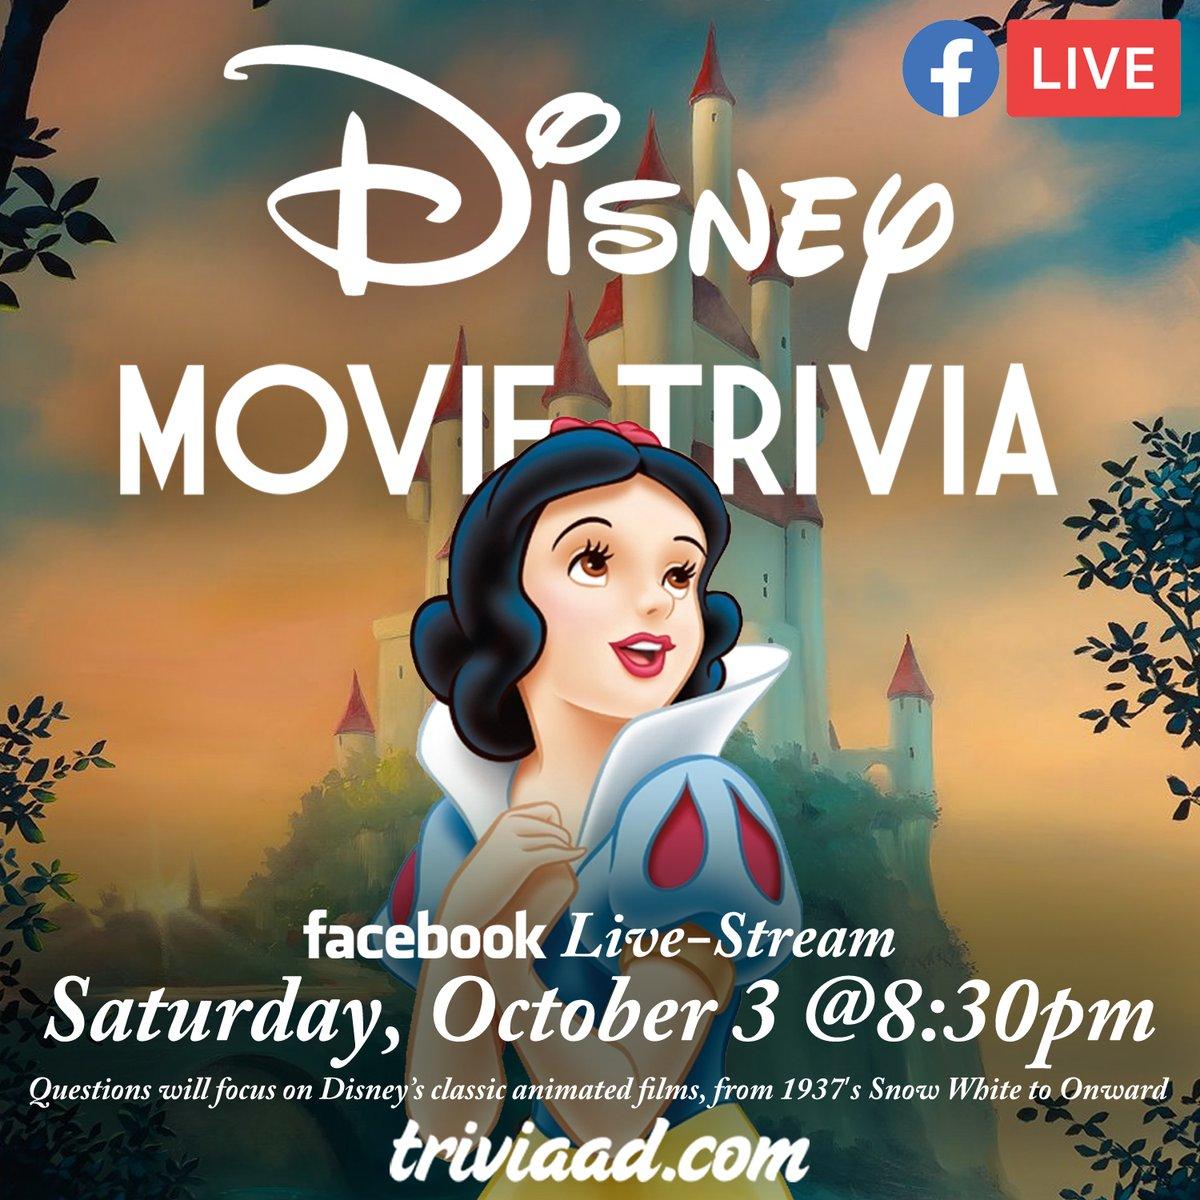 "#Disney (Movie) #Trivia #LiveStream this Saturday, October 3 starting 8:30pm ET. RSVP ""GOING"" to the #Facebook at; https://t.co/s071F27NDS #DisneyMovie #DisneyMovies #Pixar #FacebookLiveStream https://t.co/rjfmemk1Jp"